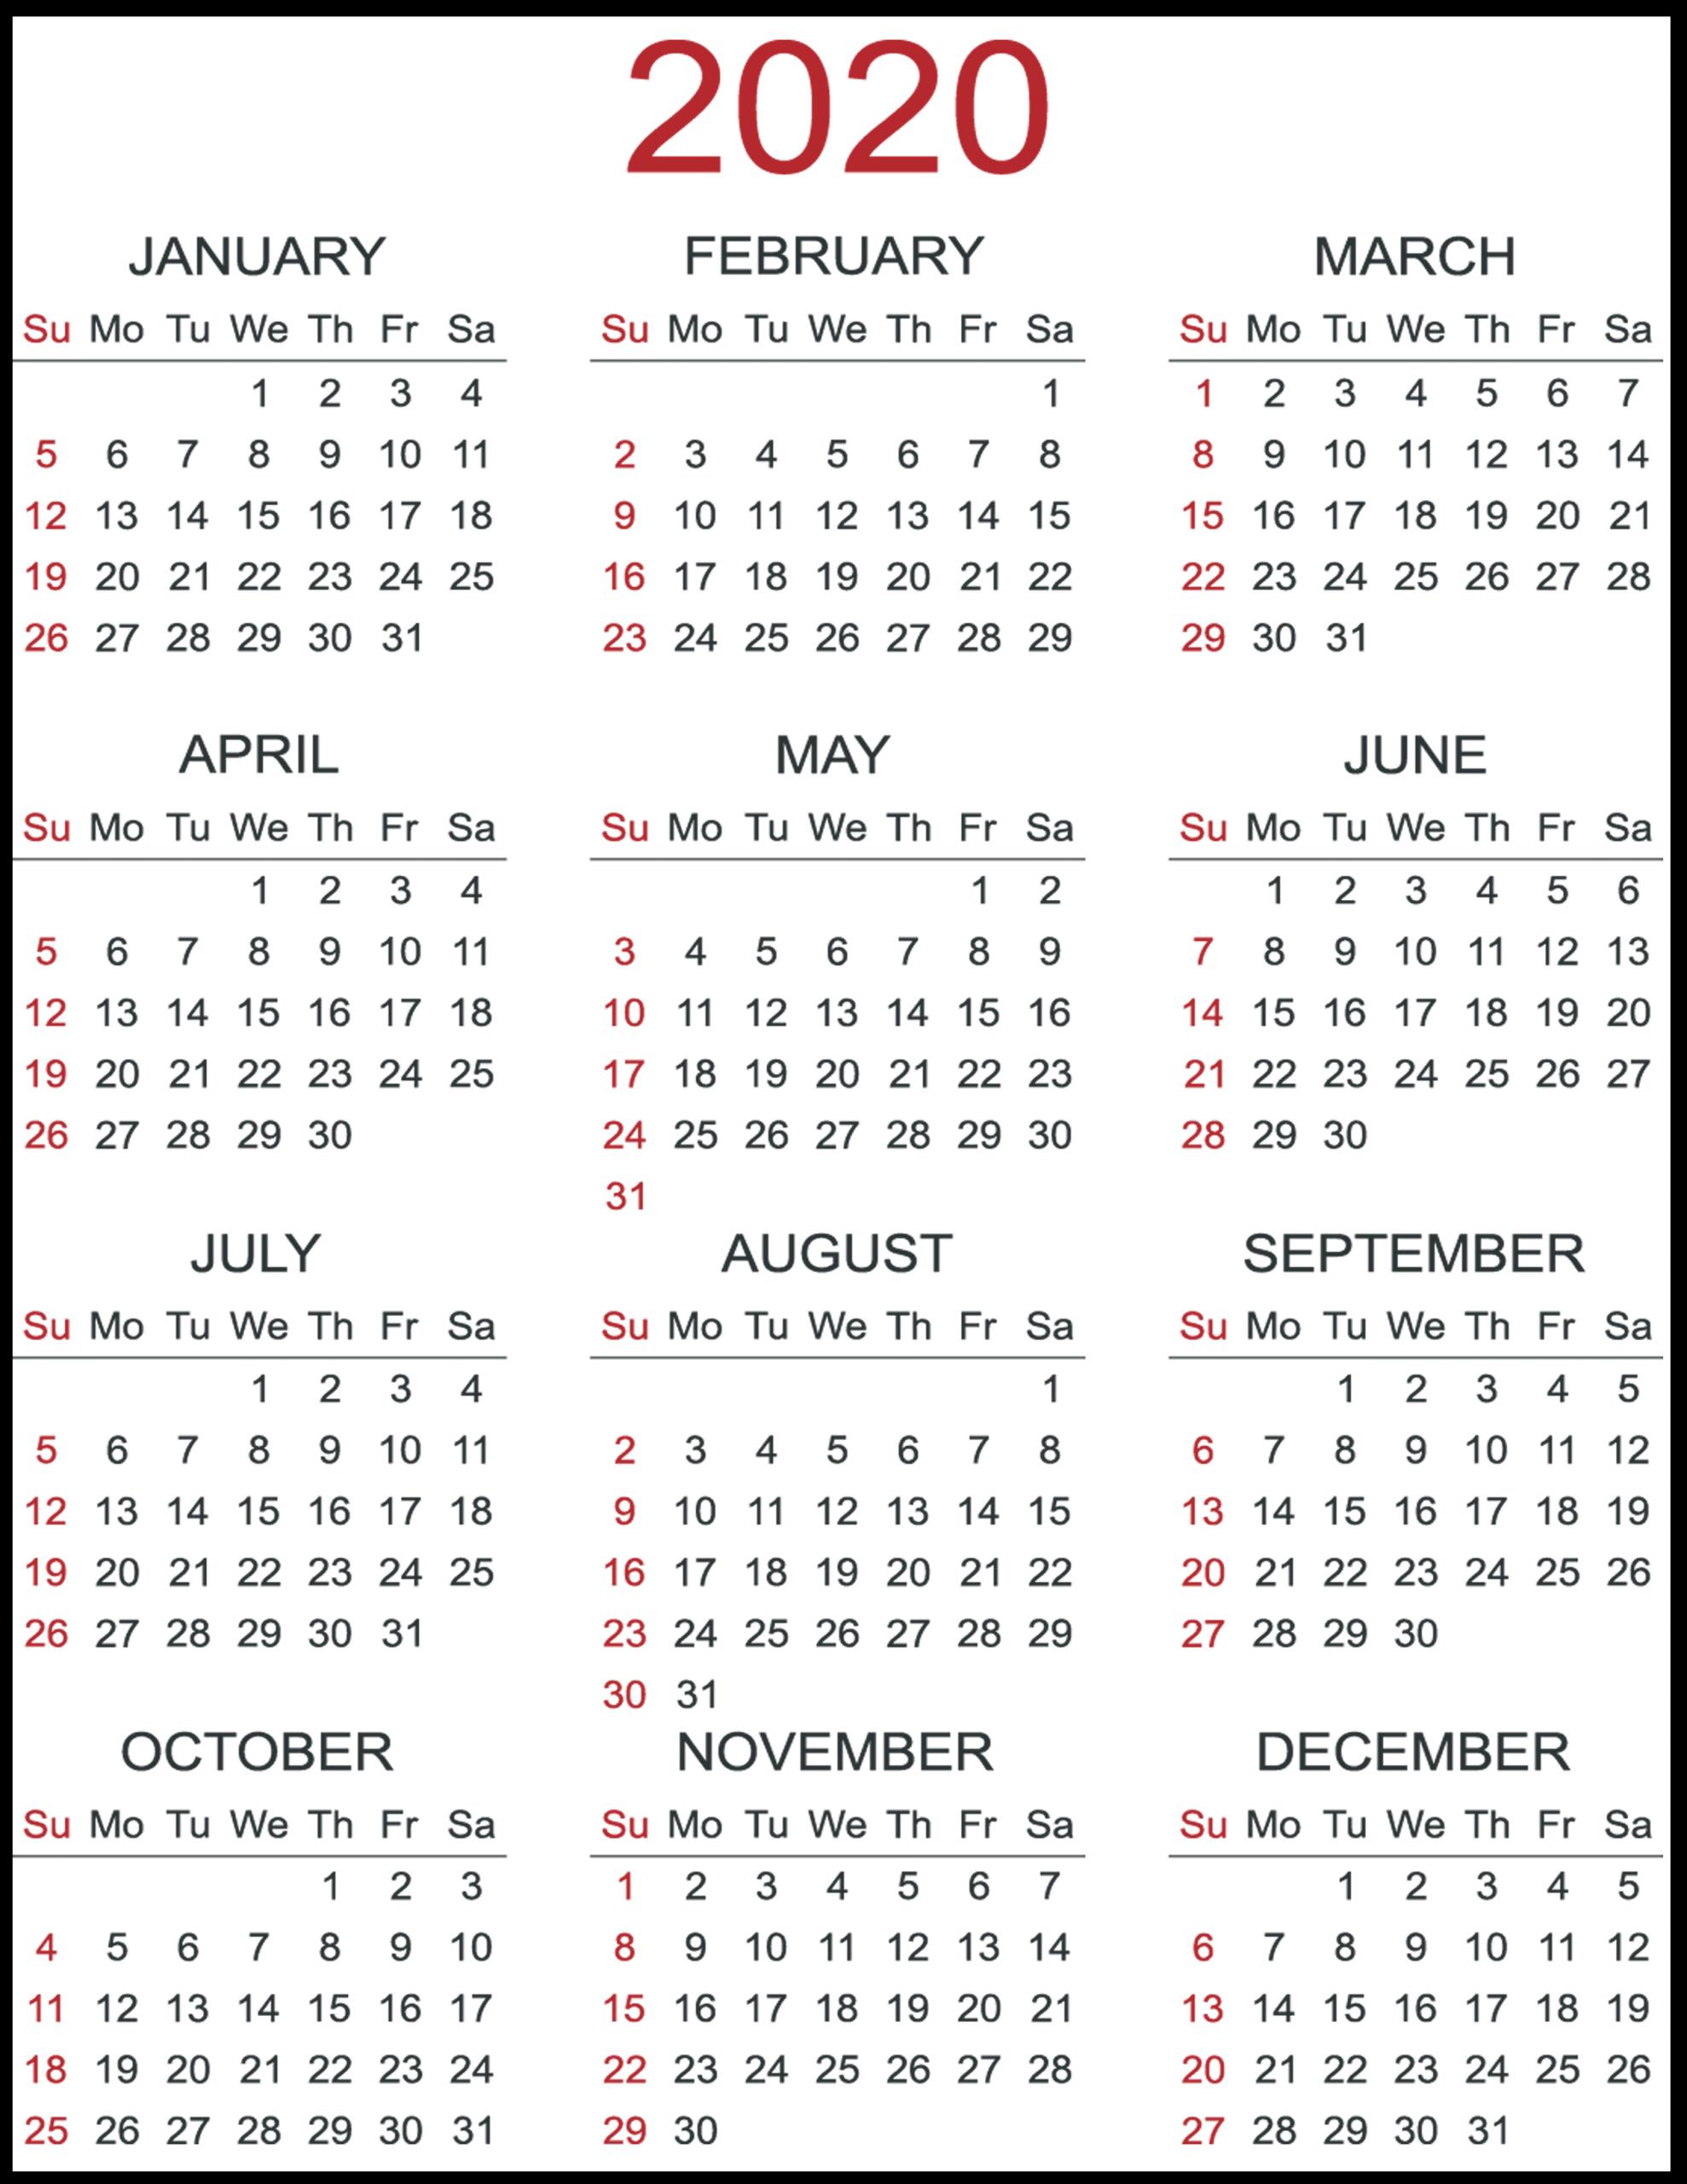 2020 Calendar Printable Free - Togo.wpart.co